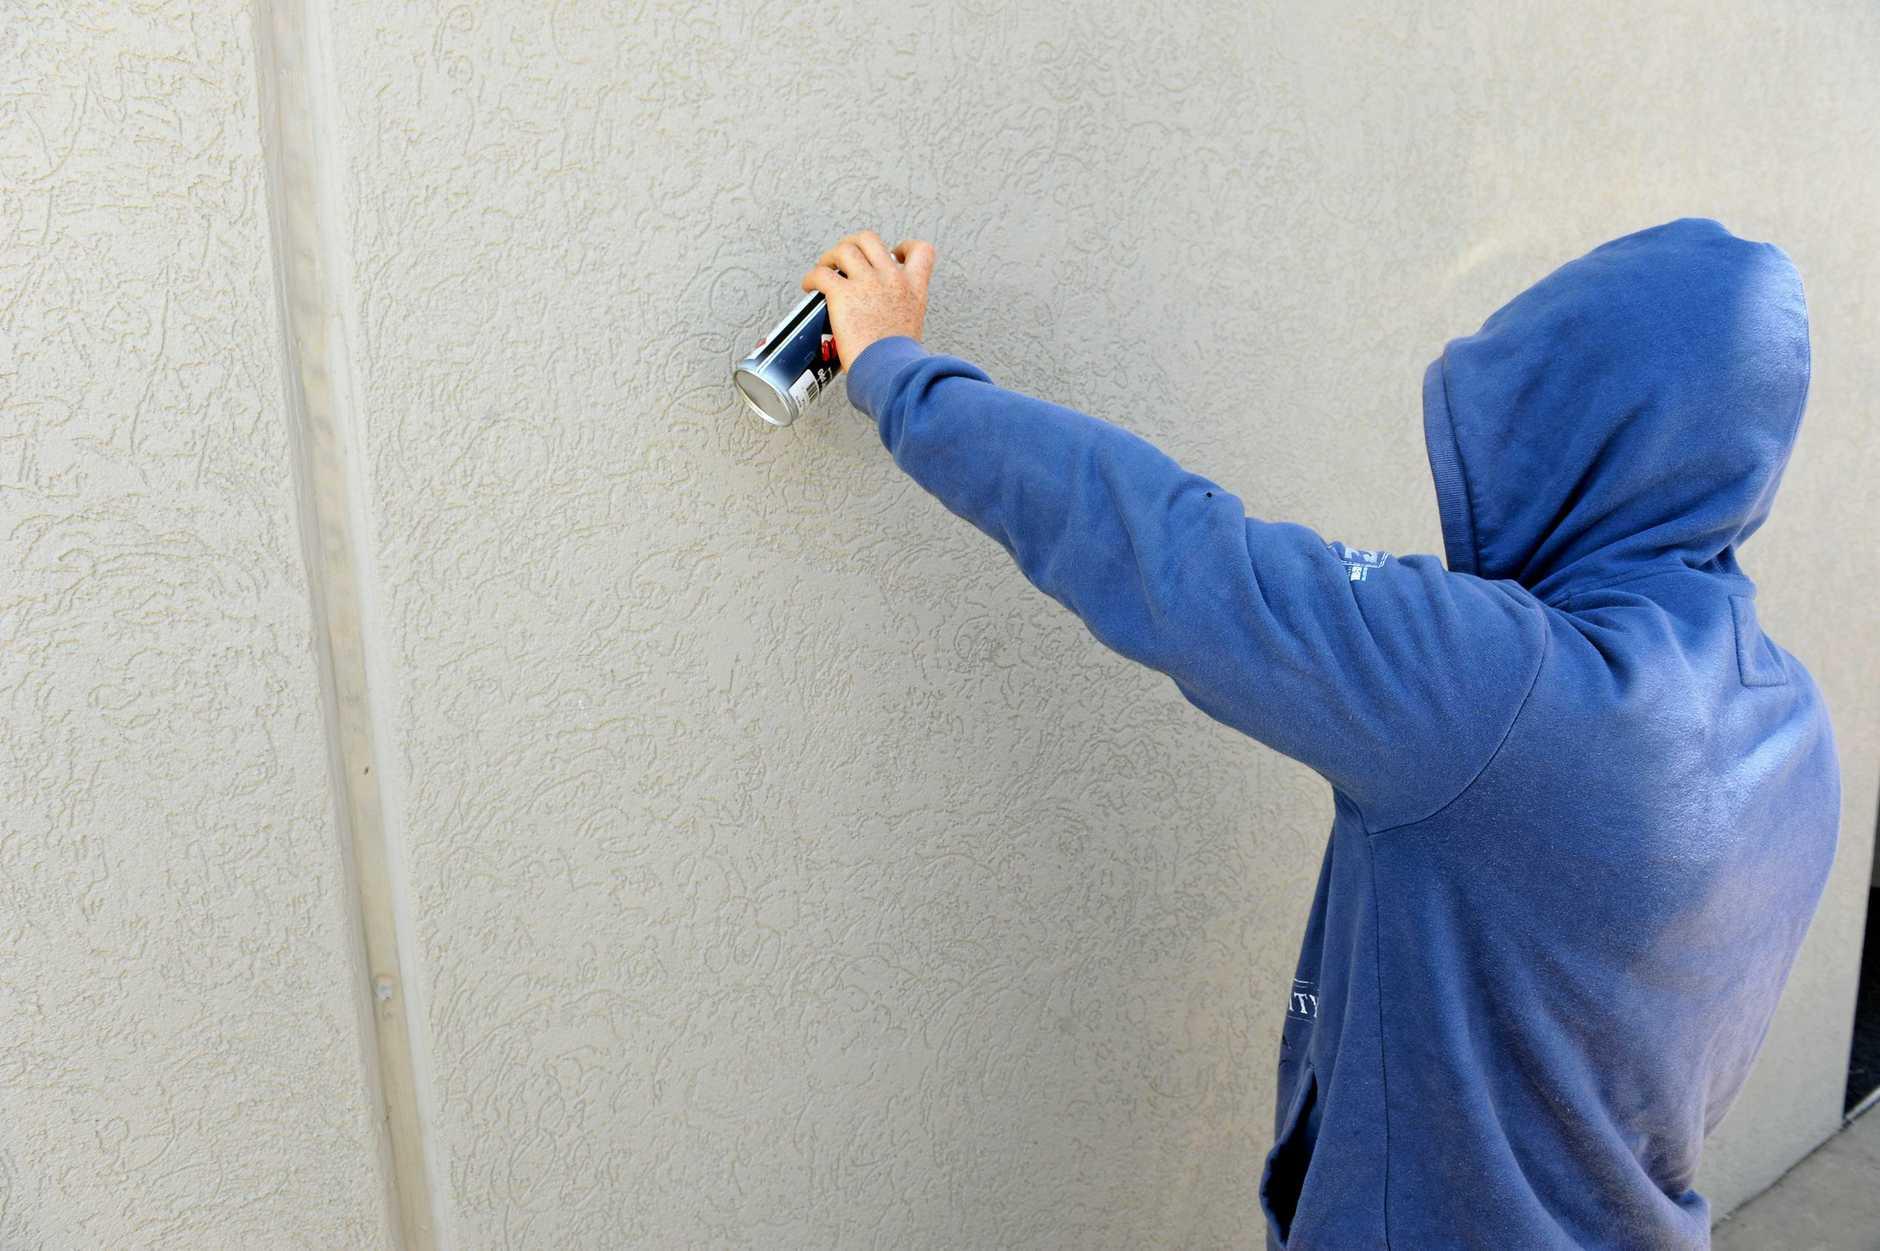 A man who graffitied a Bowen school has faced court.